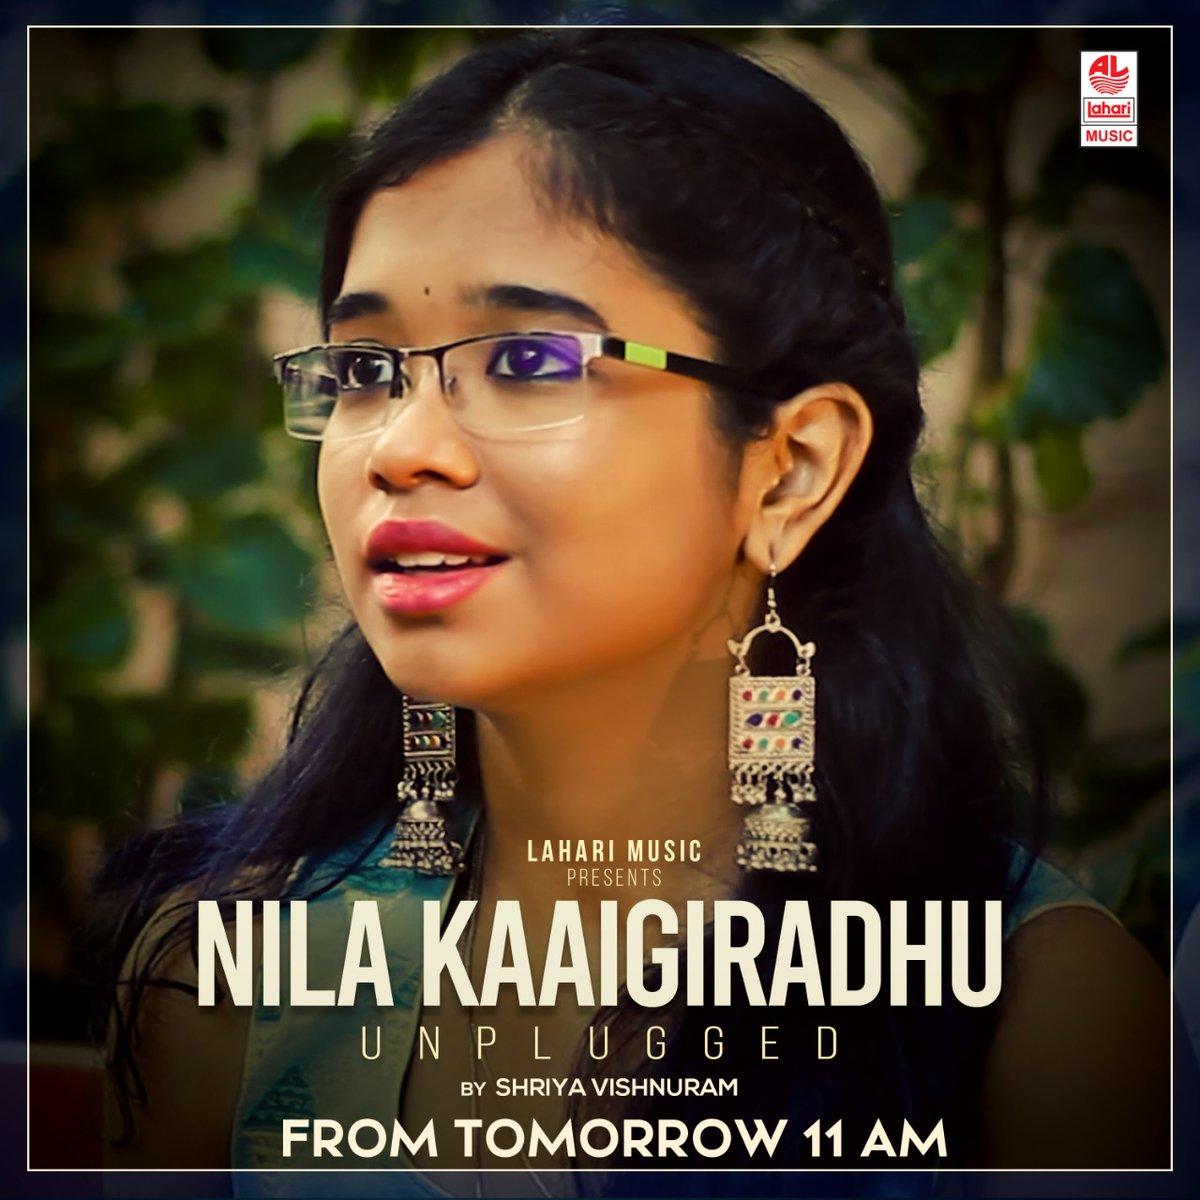 #LahariMusic presents #NilaKaaigiradhu unplugged by #ShriyaVishnuram releasing tomorrow at 11 AM.